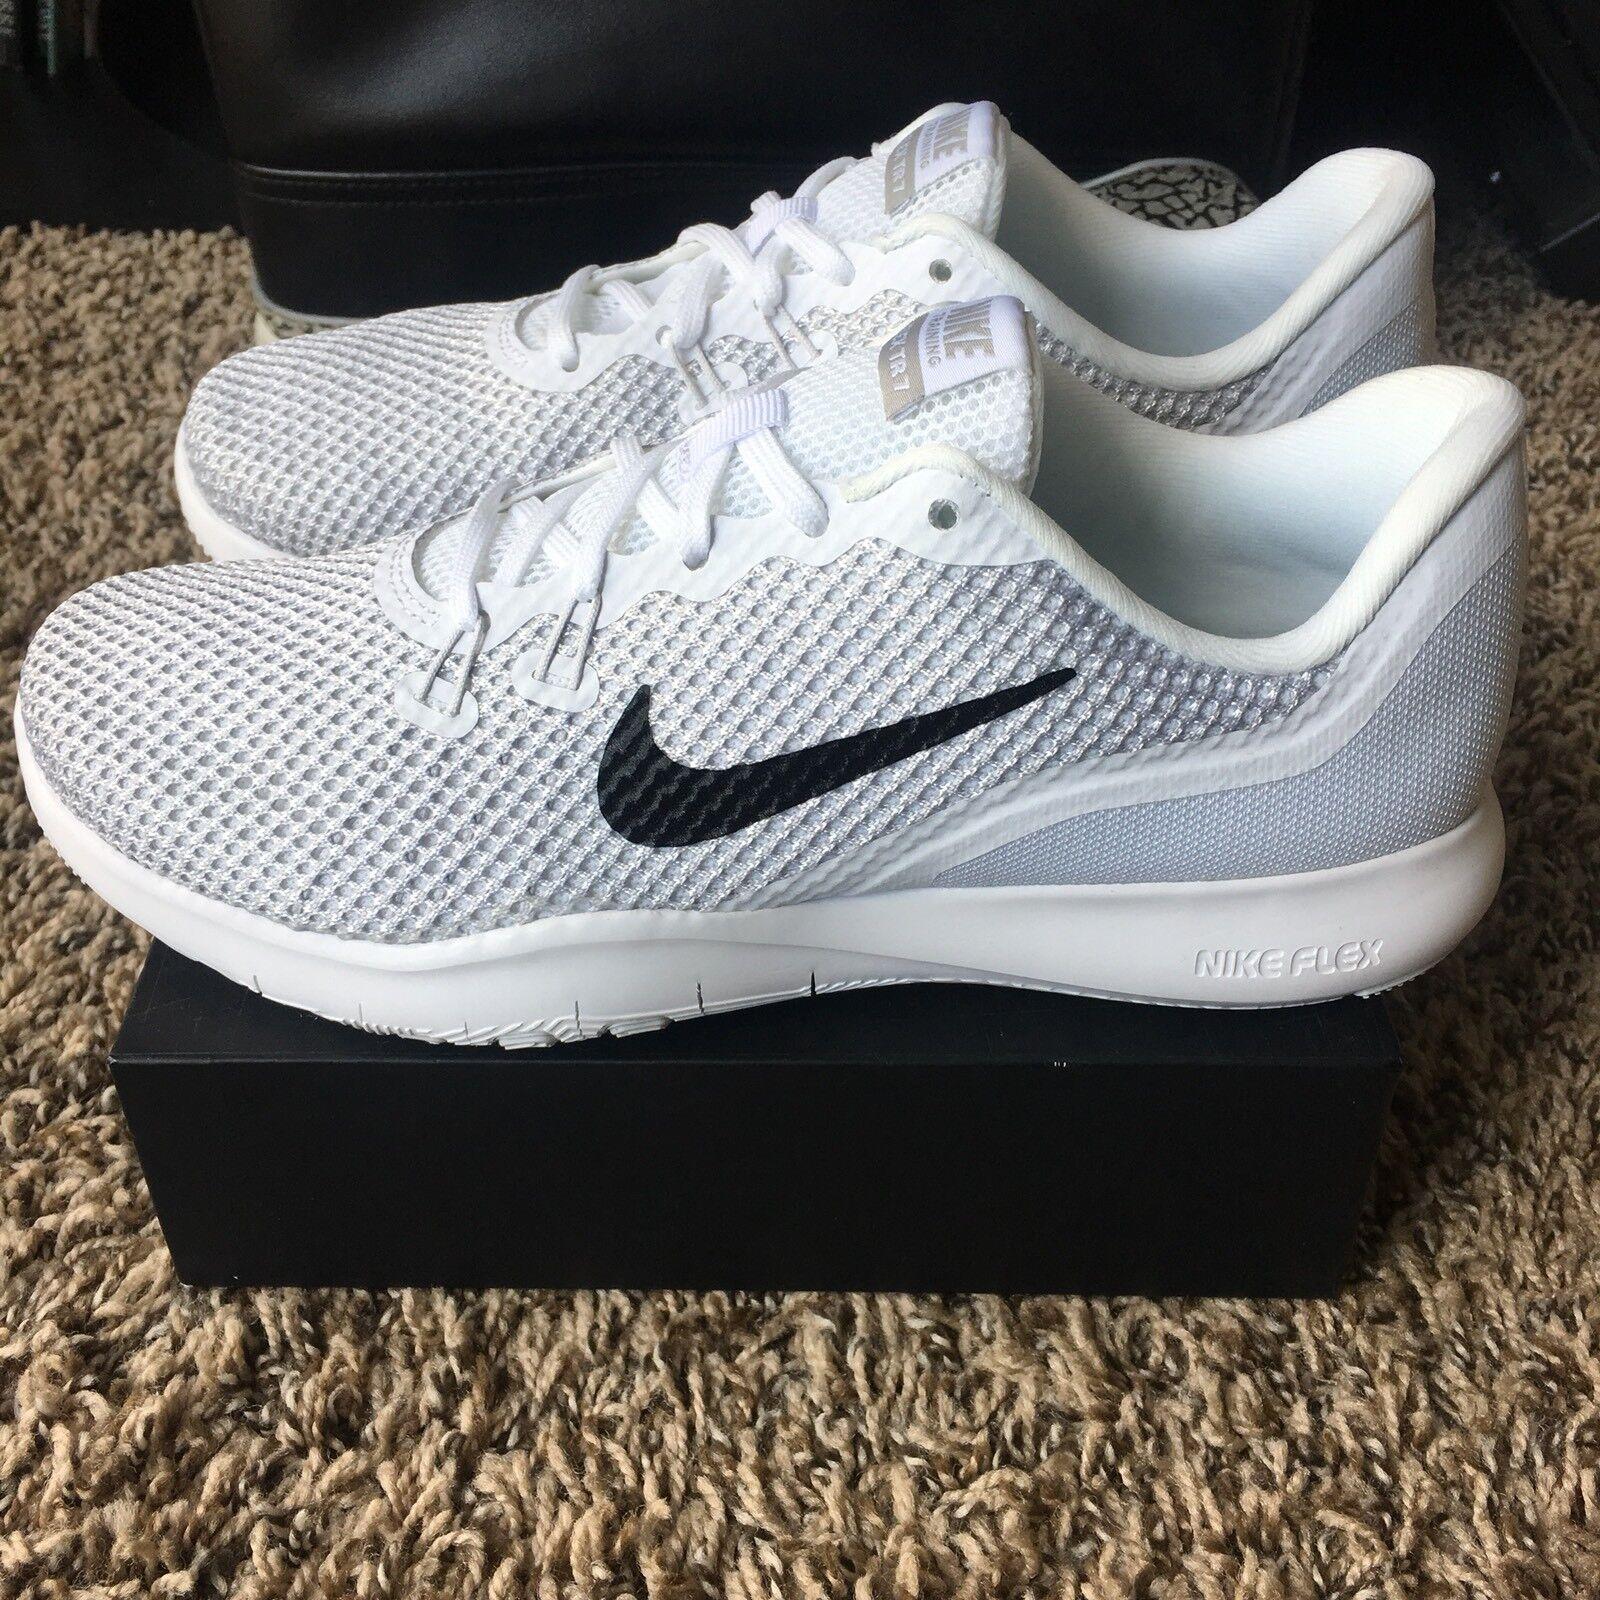 4b1f41839680 Nike Womens Flex Flex Flex Trainer 7 White Metallic Silver Shoes 898479 100  NEW 294c9d